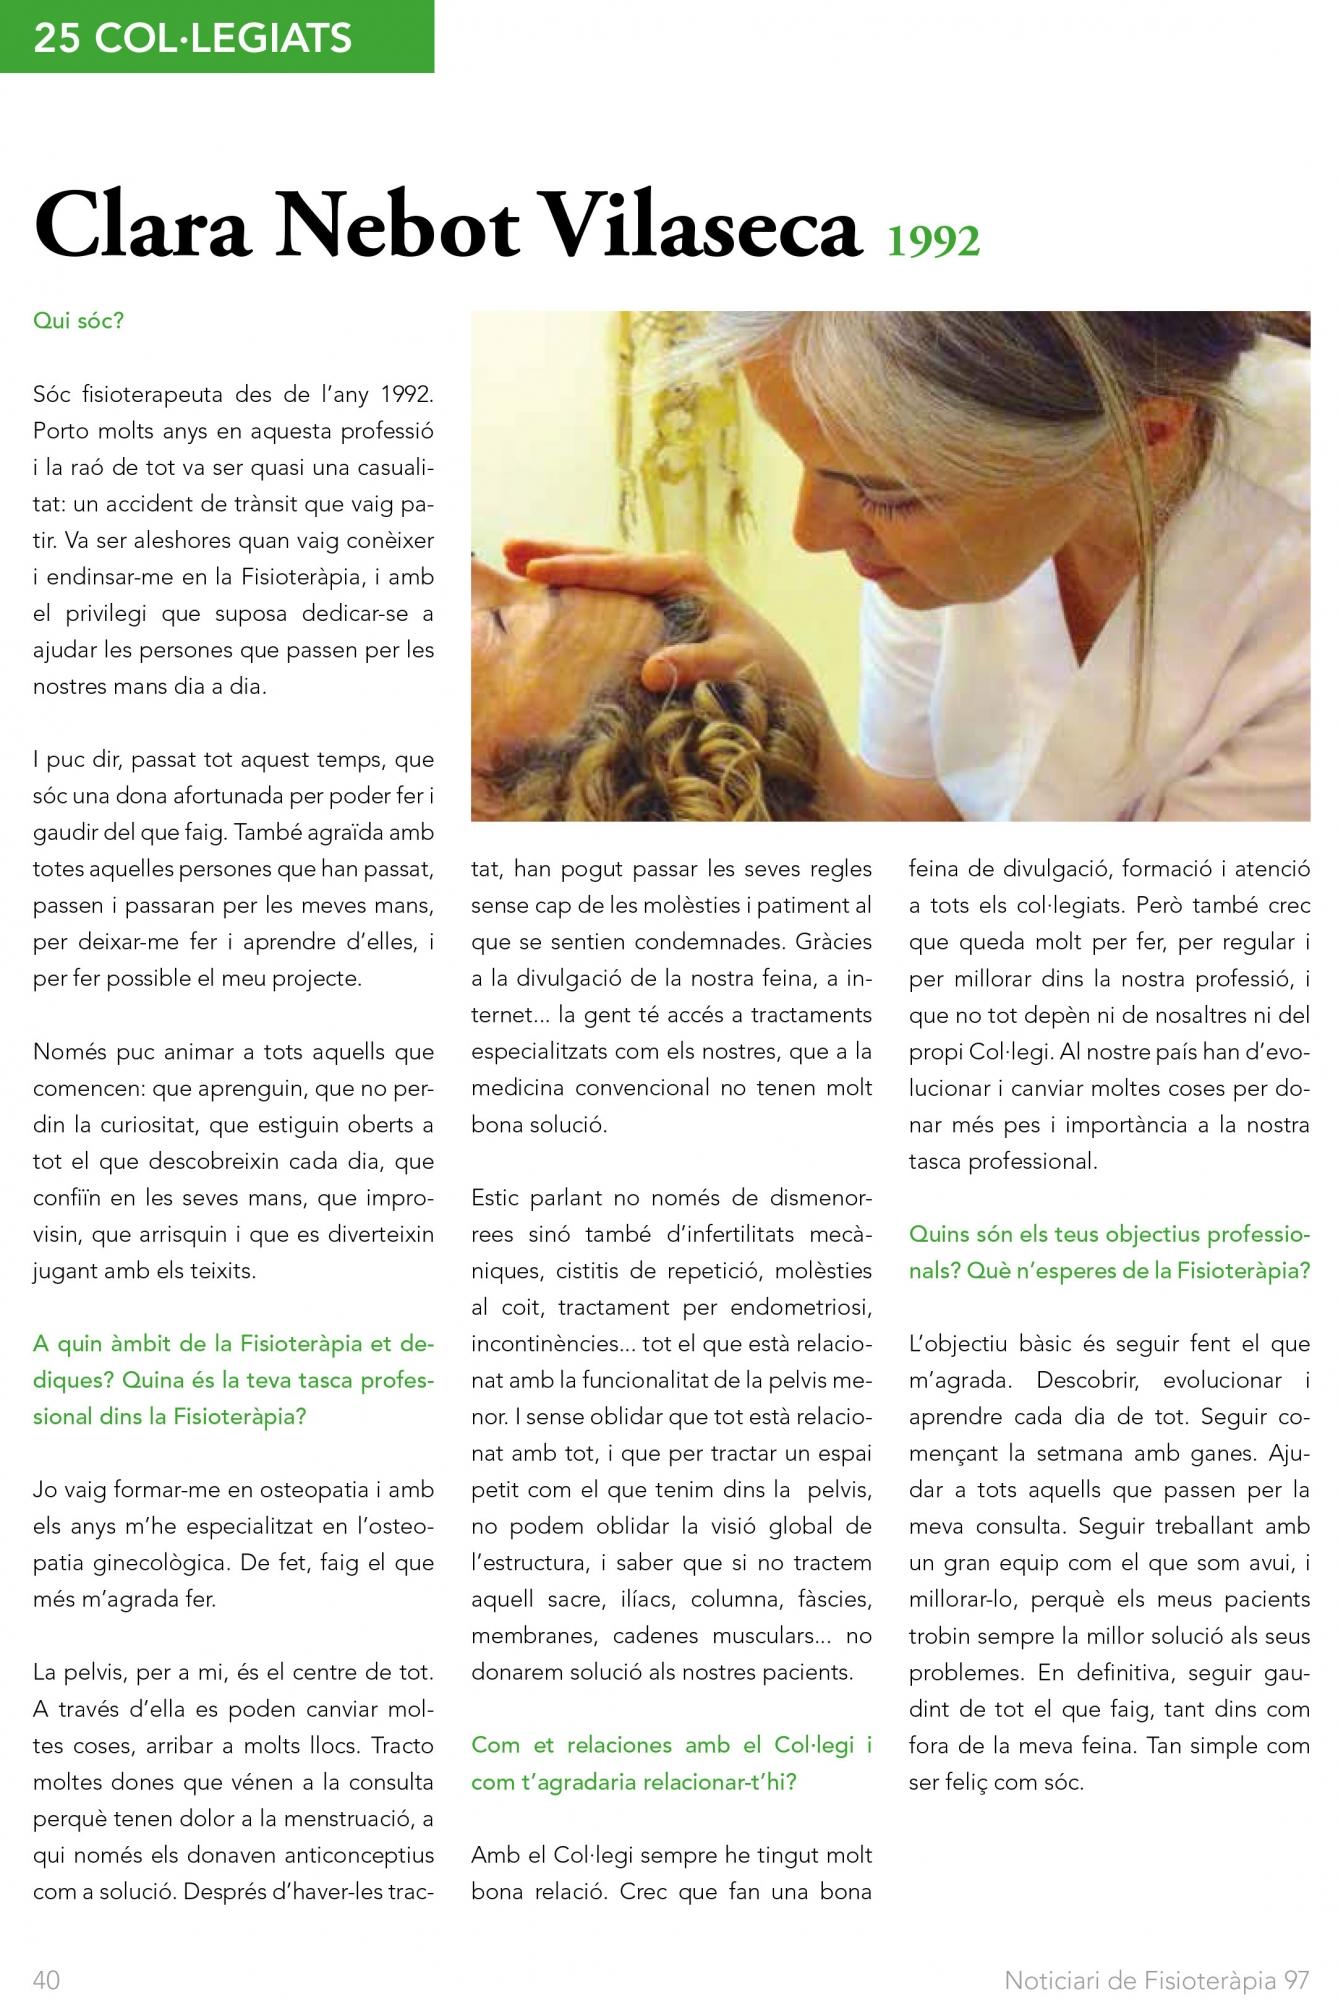 Clara Nebot entrevistada por el Col·legi de Fisioterapeutes de Catalunya